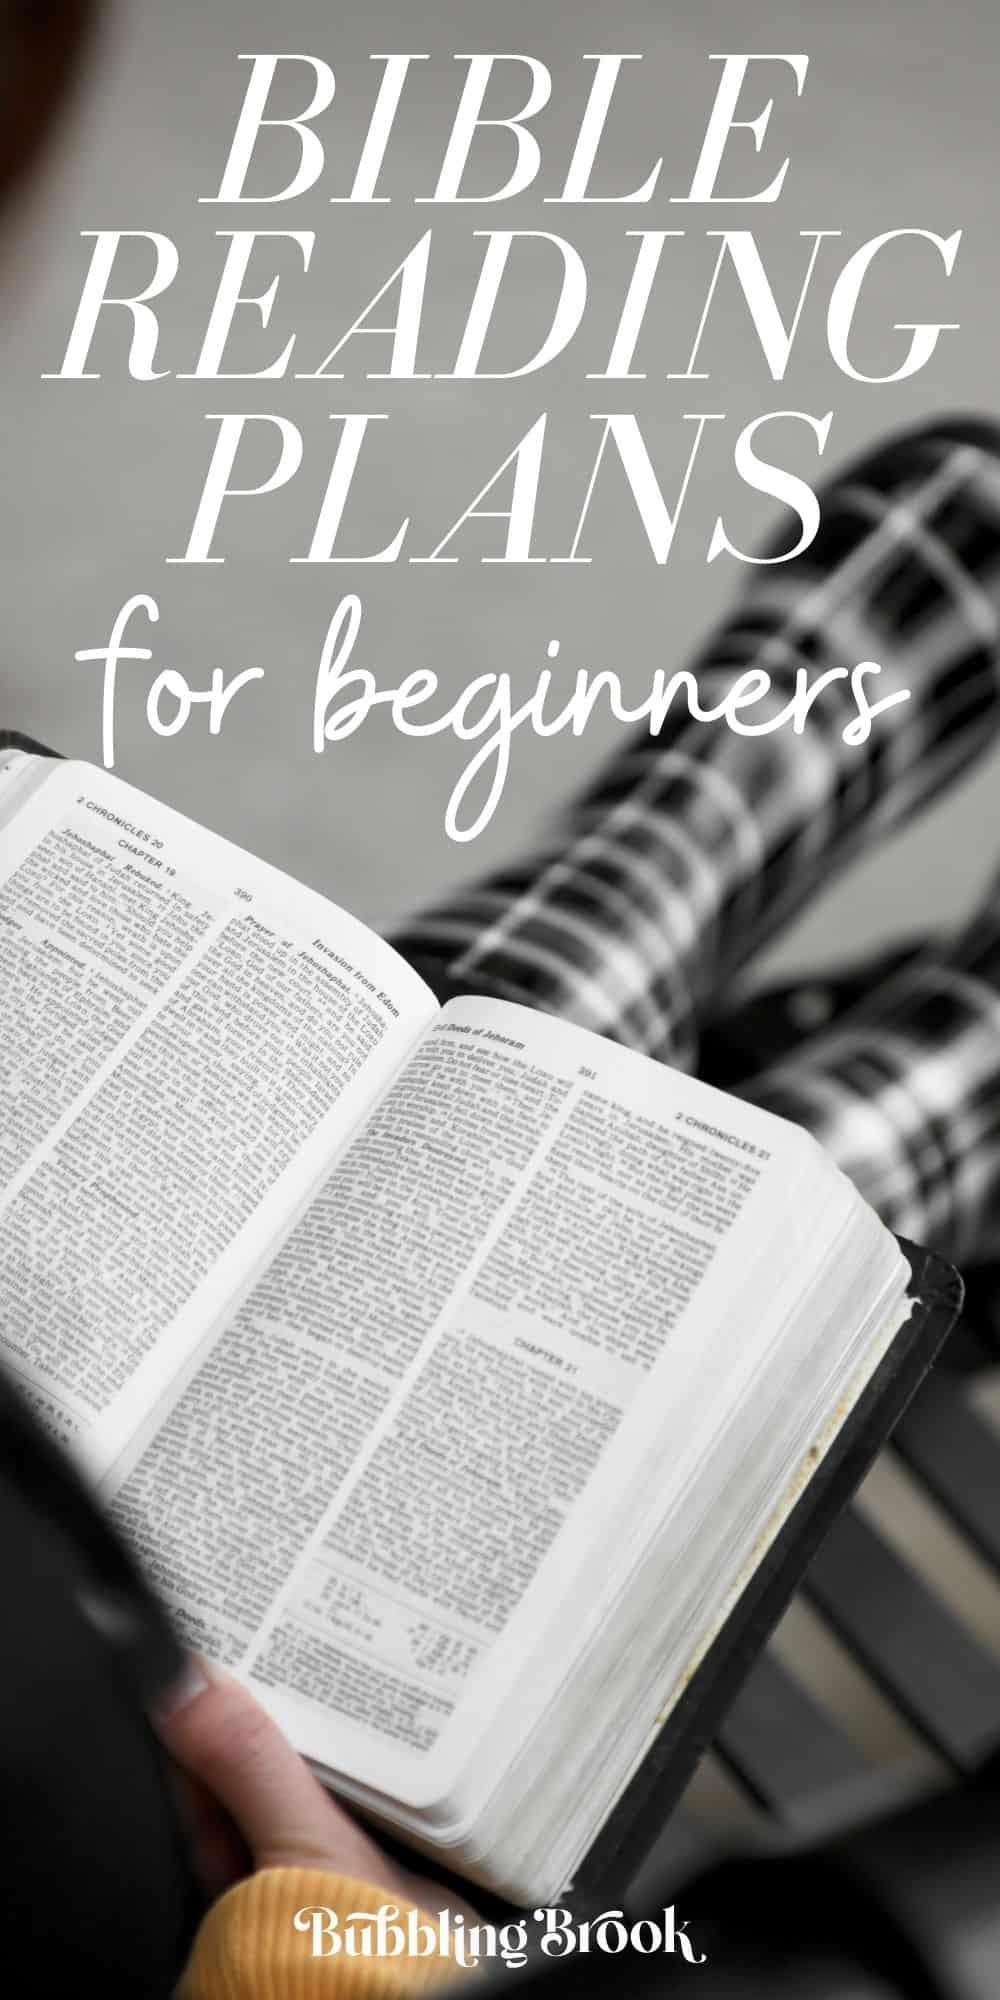 Bible reading plans for beginners - pin for Pinterest